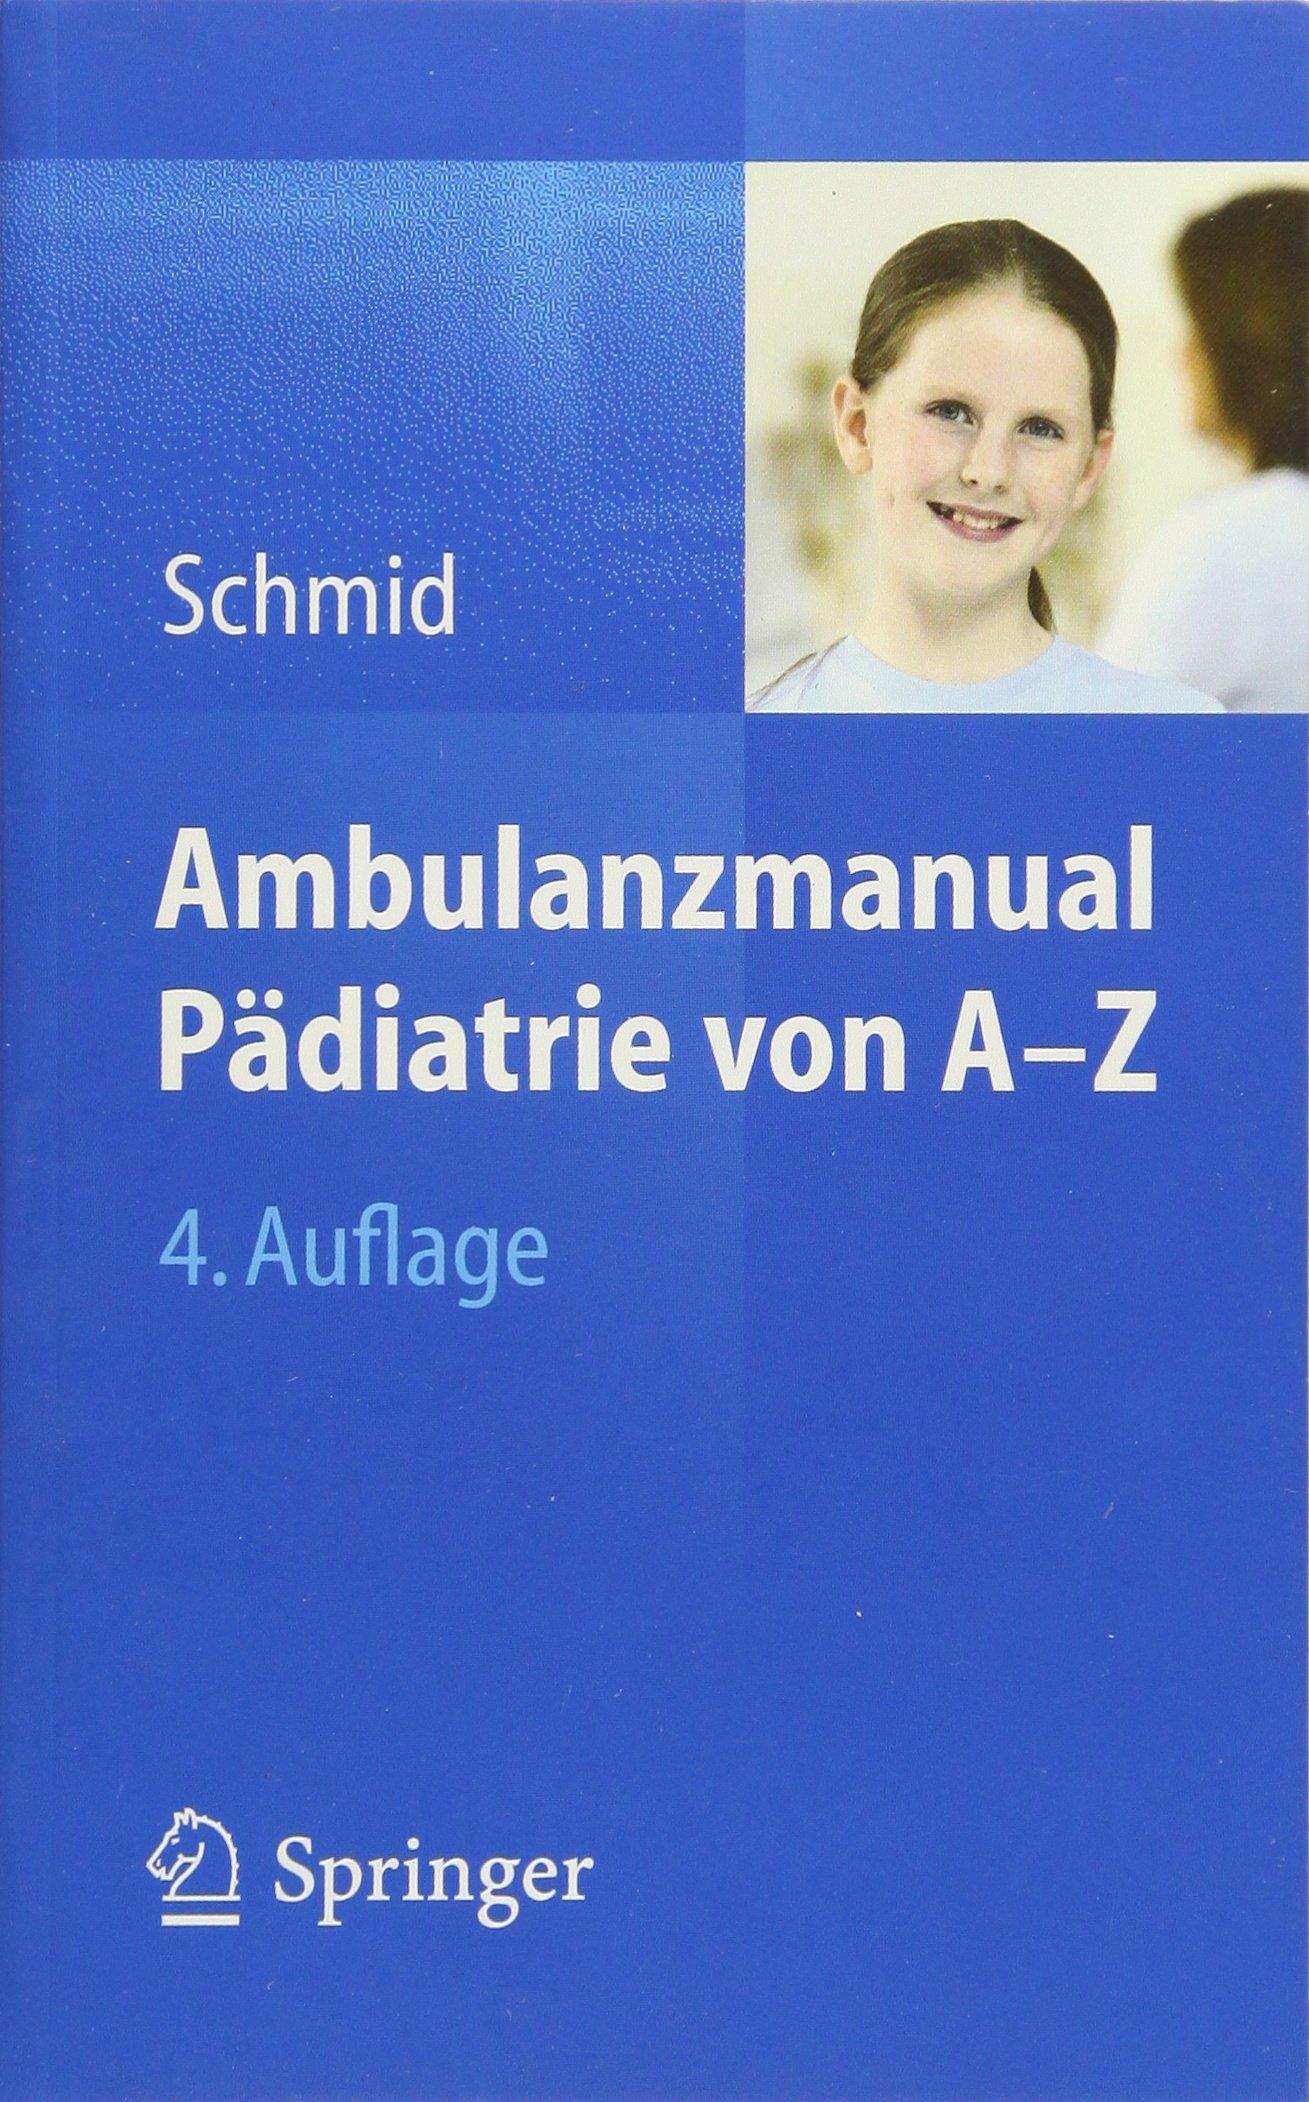 ambulanzmanual-pdiatrie-von-a-z